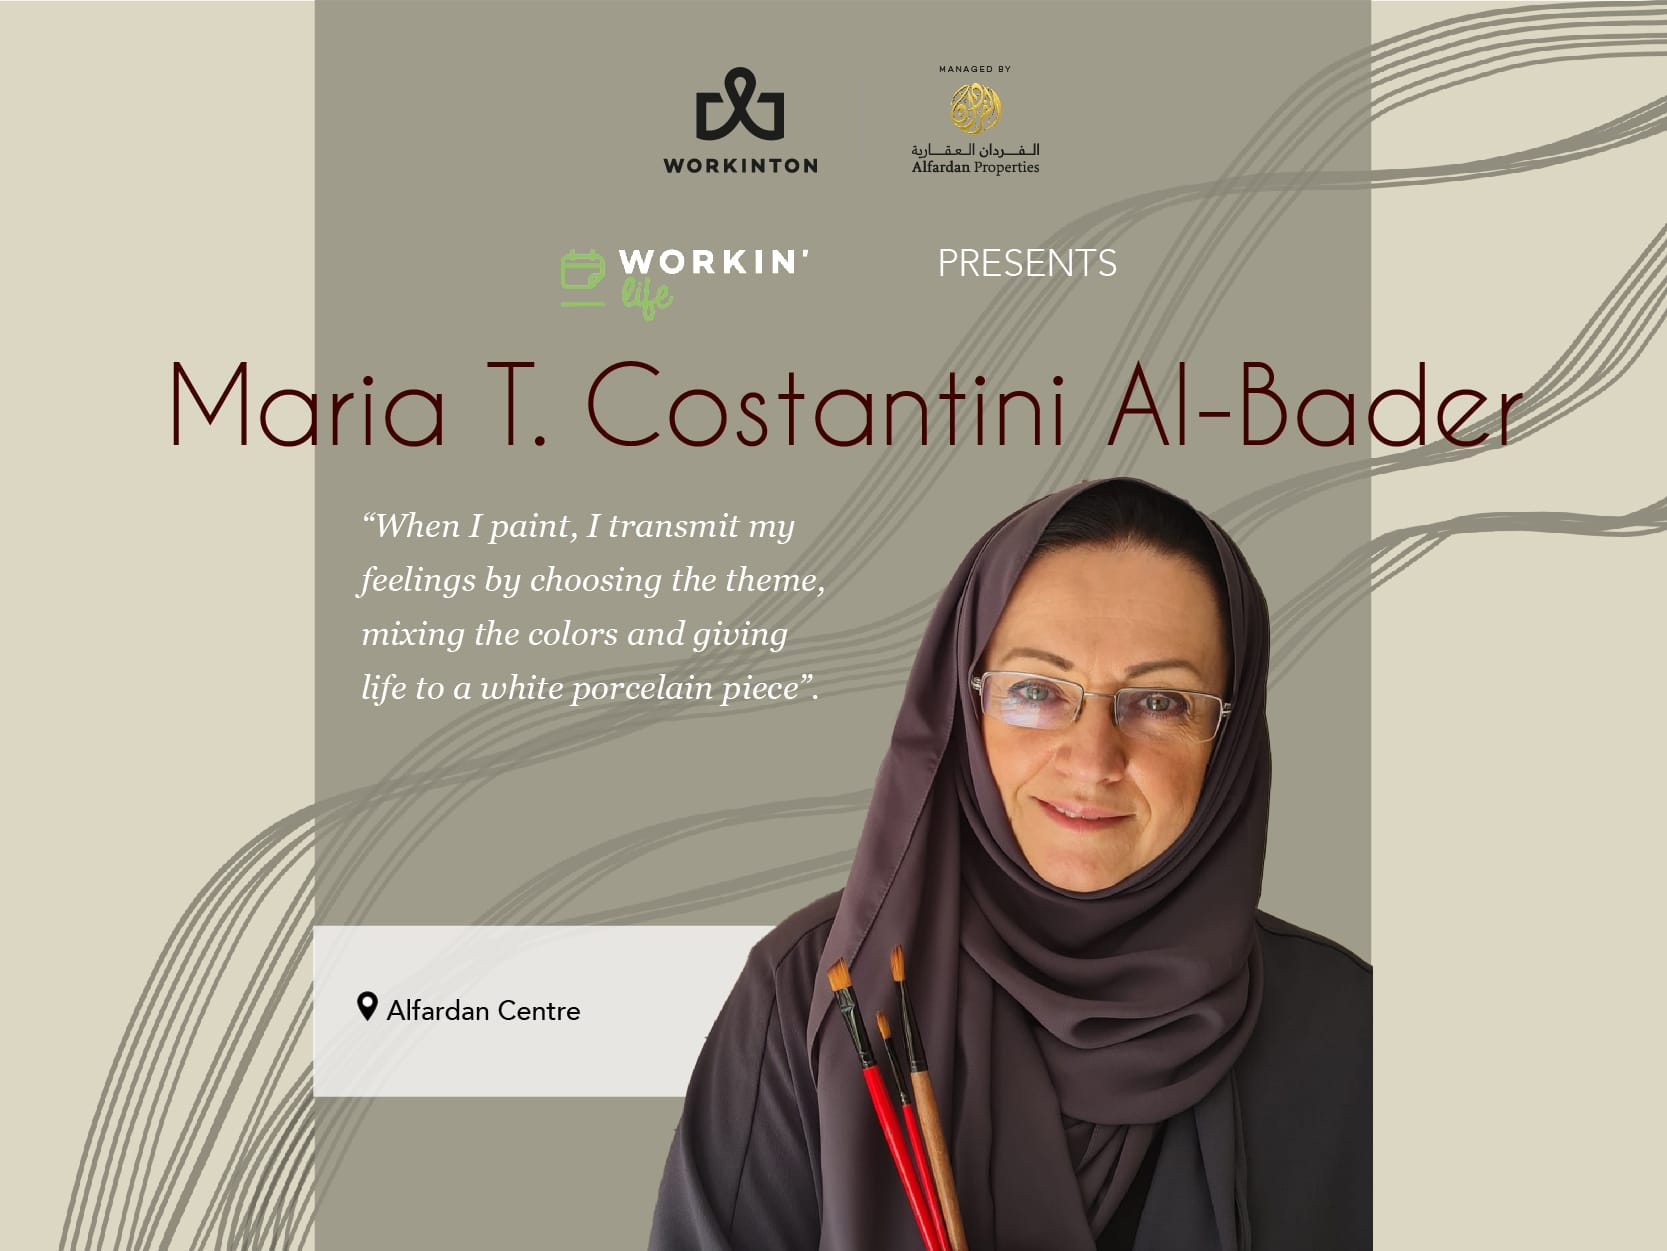 Maria T. Costantini Al-Bader